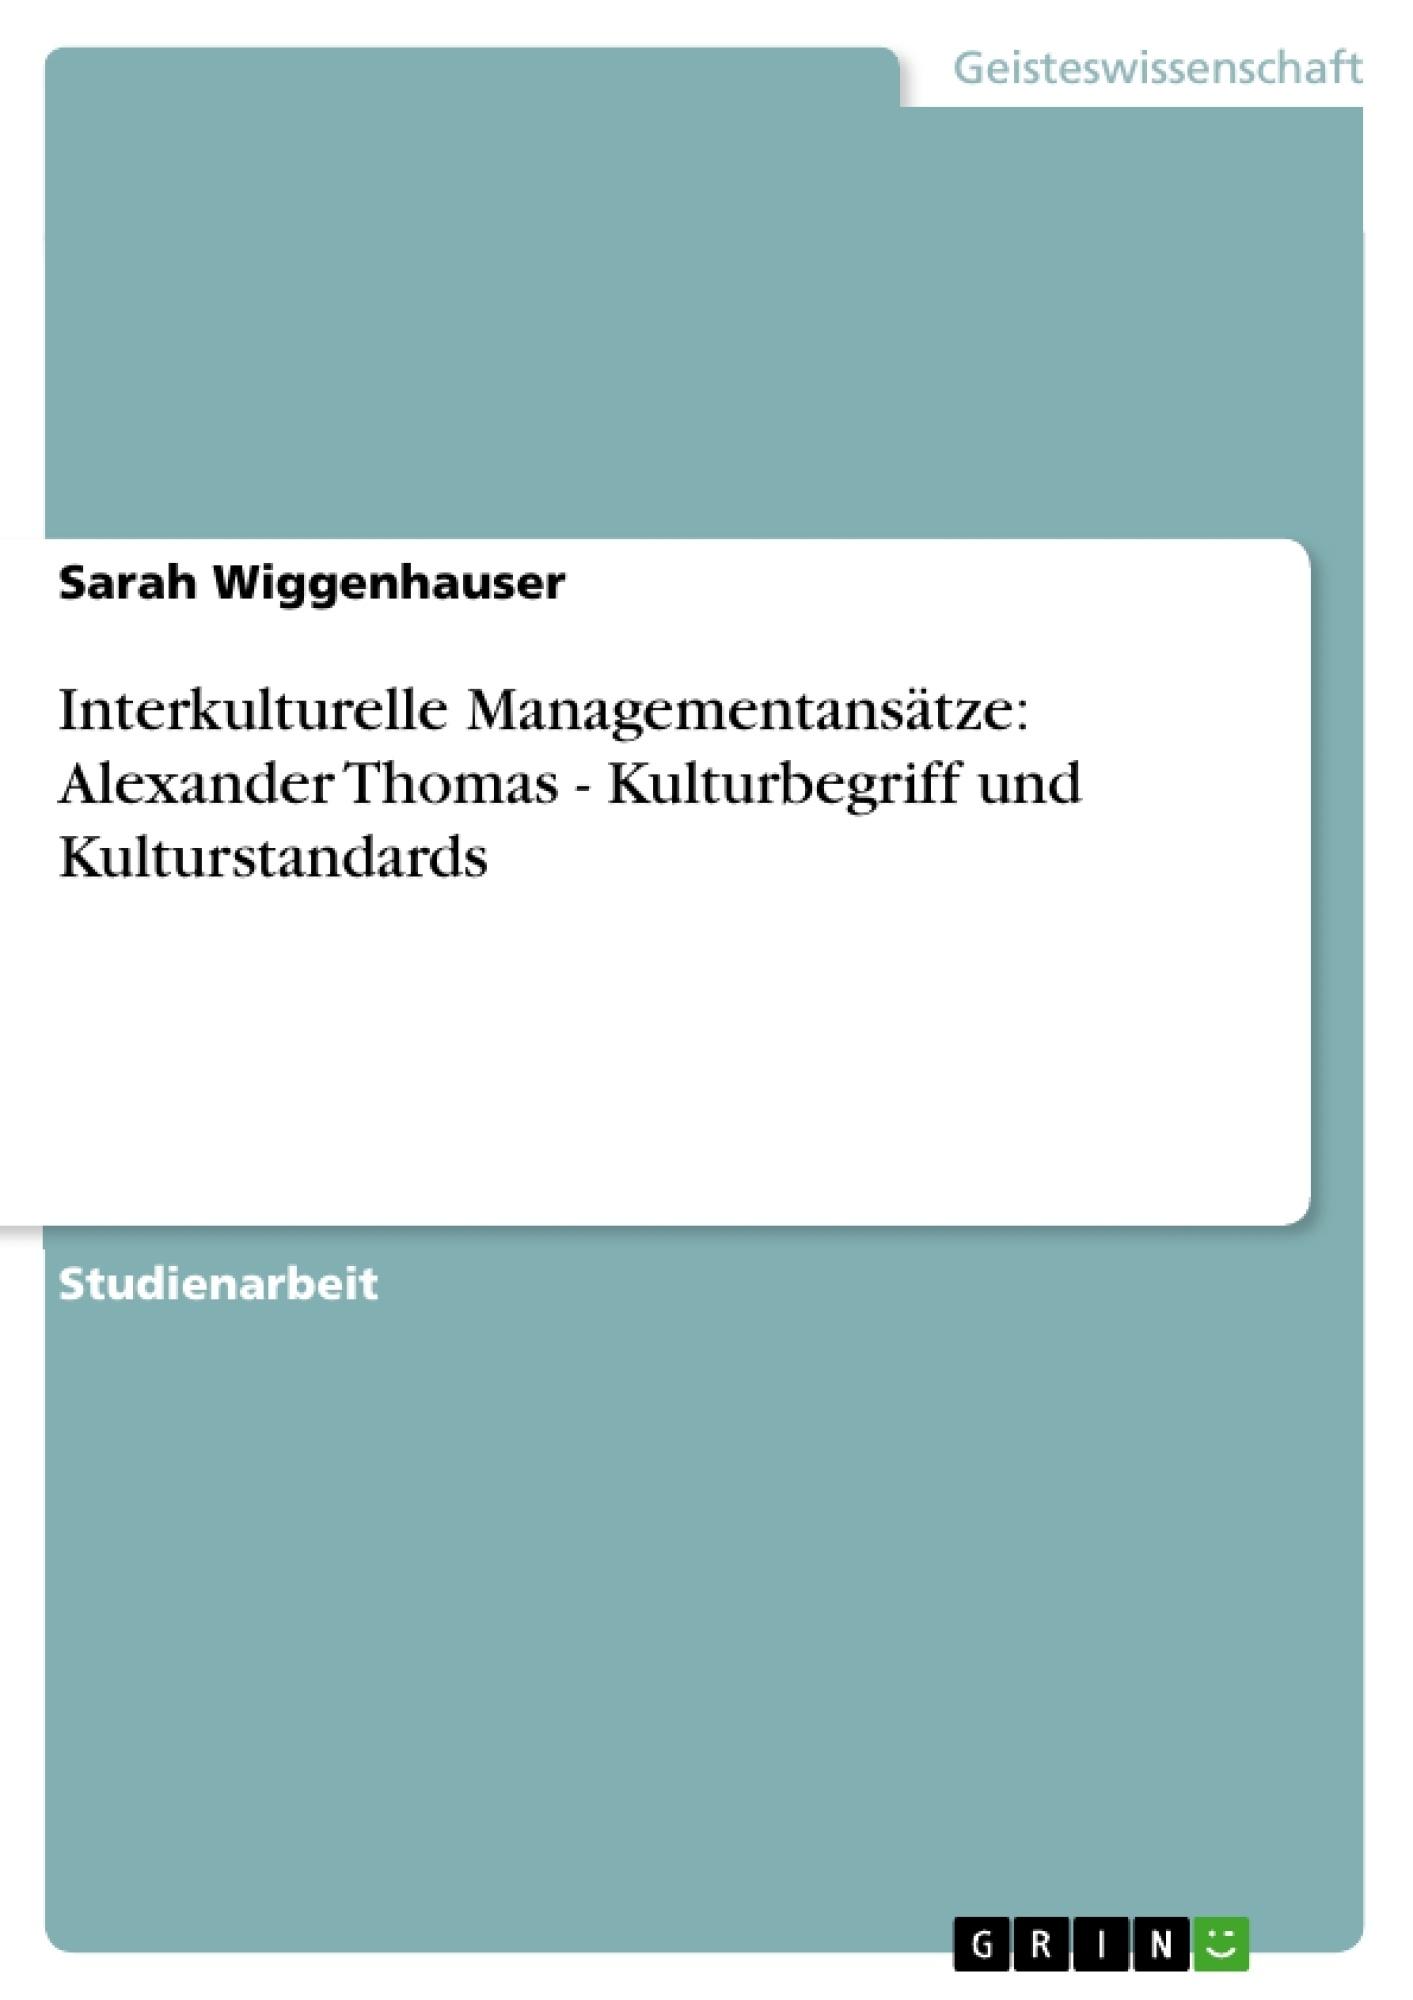 Titel: Interkulturelle Managementansätze: Alexander Thomas - Kulturbegriff und Kulturstandards